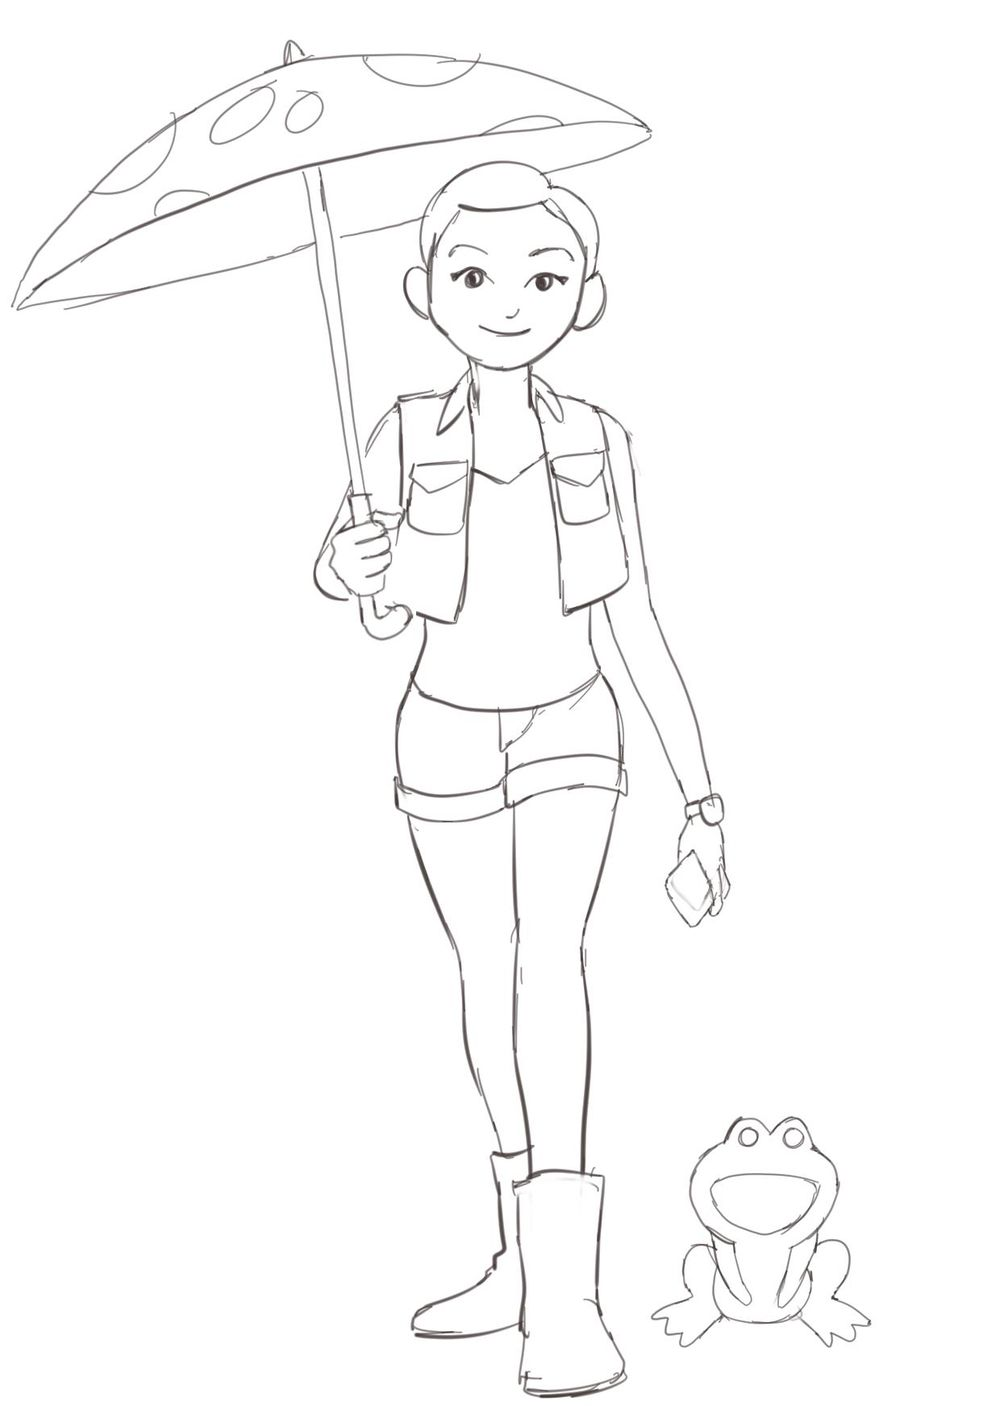 Rain Girl - image 1 - student project